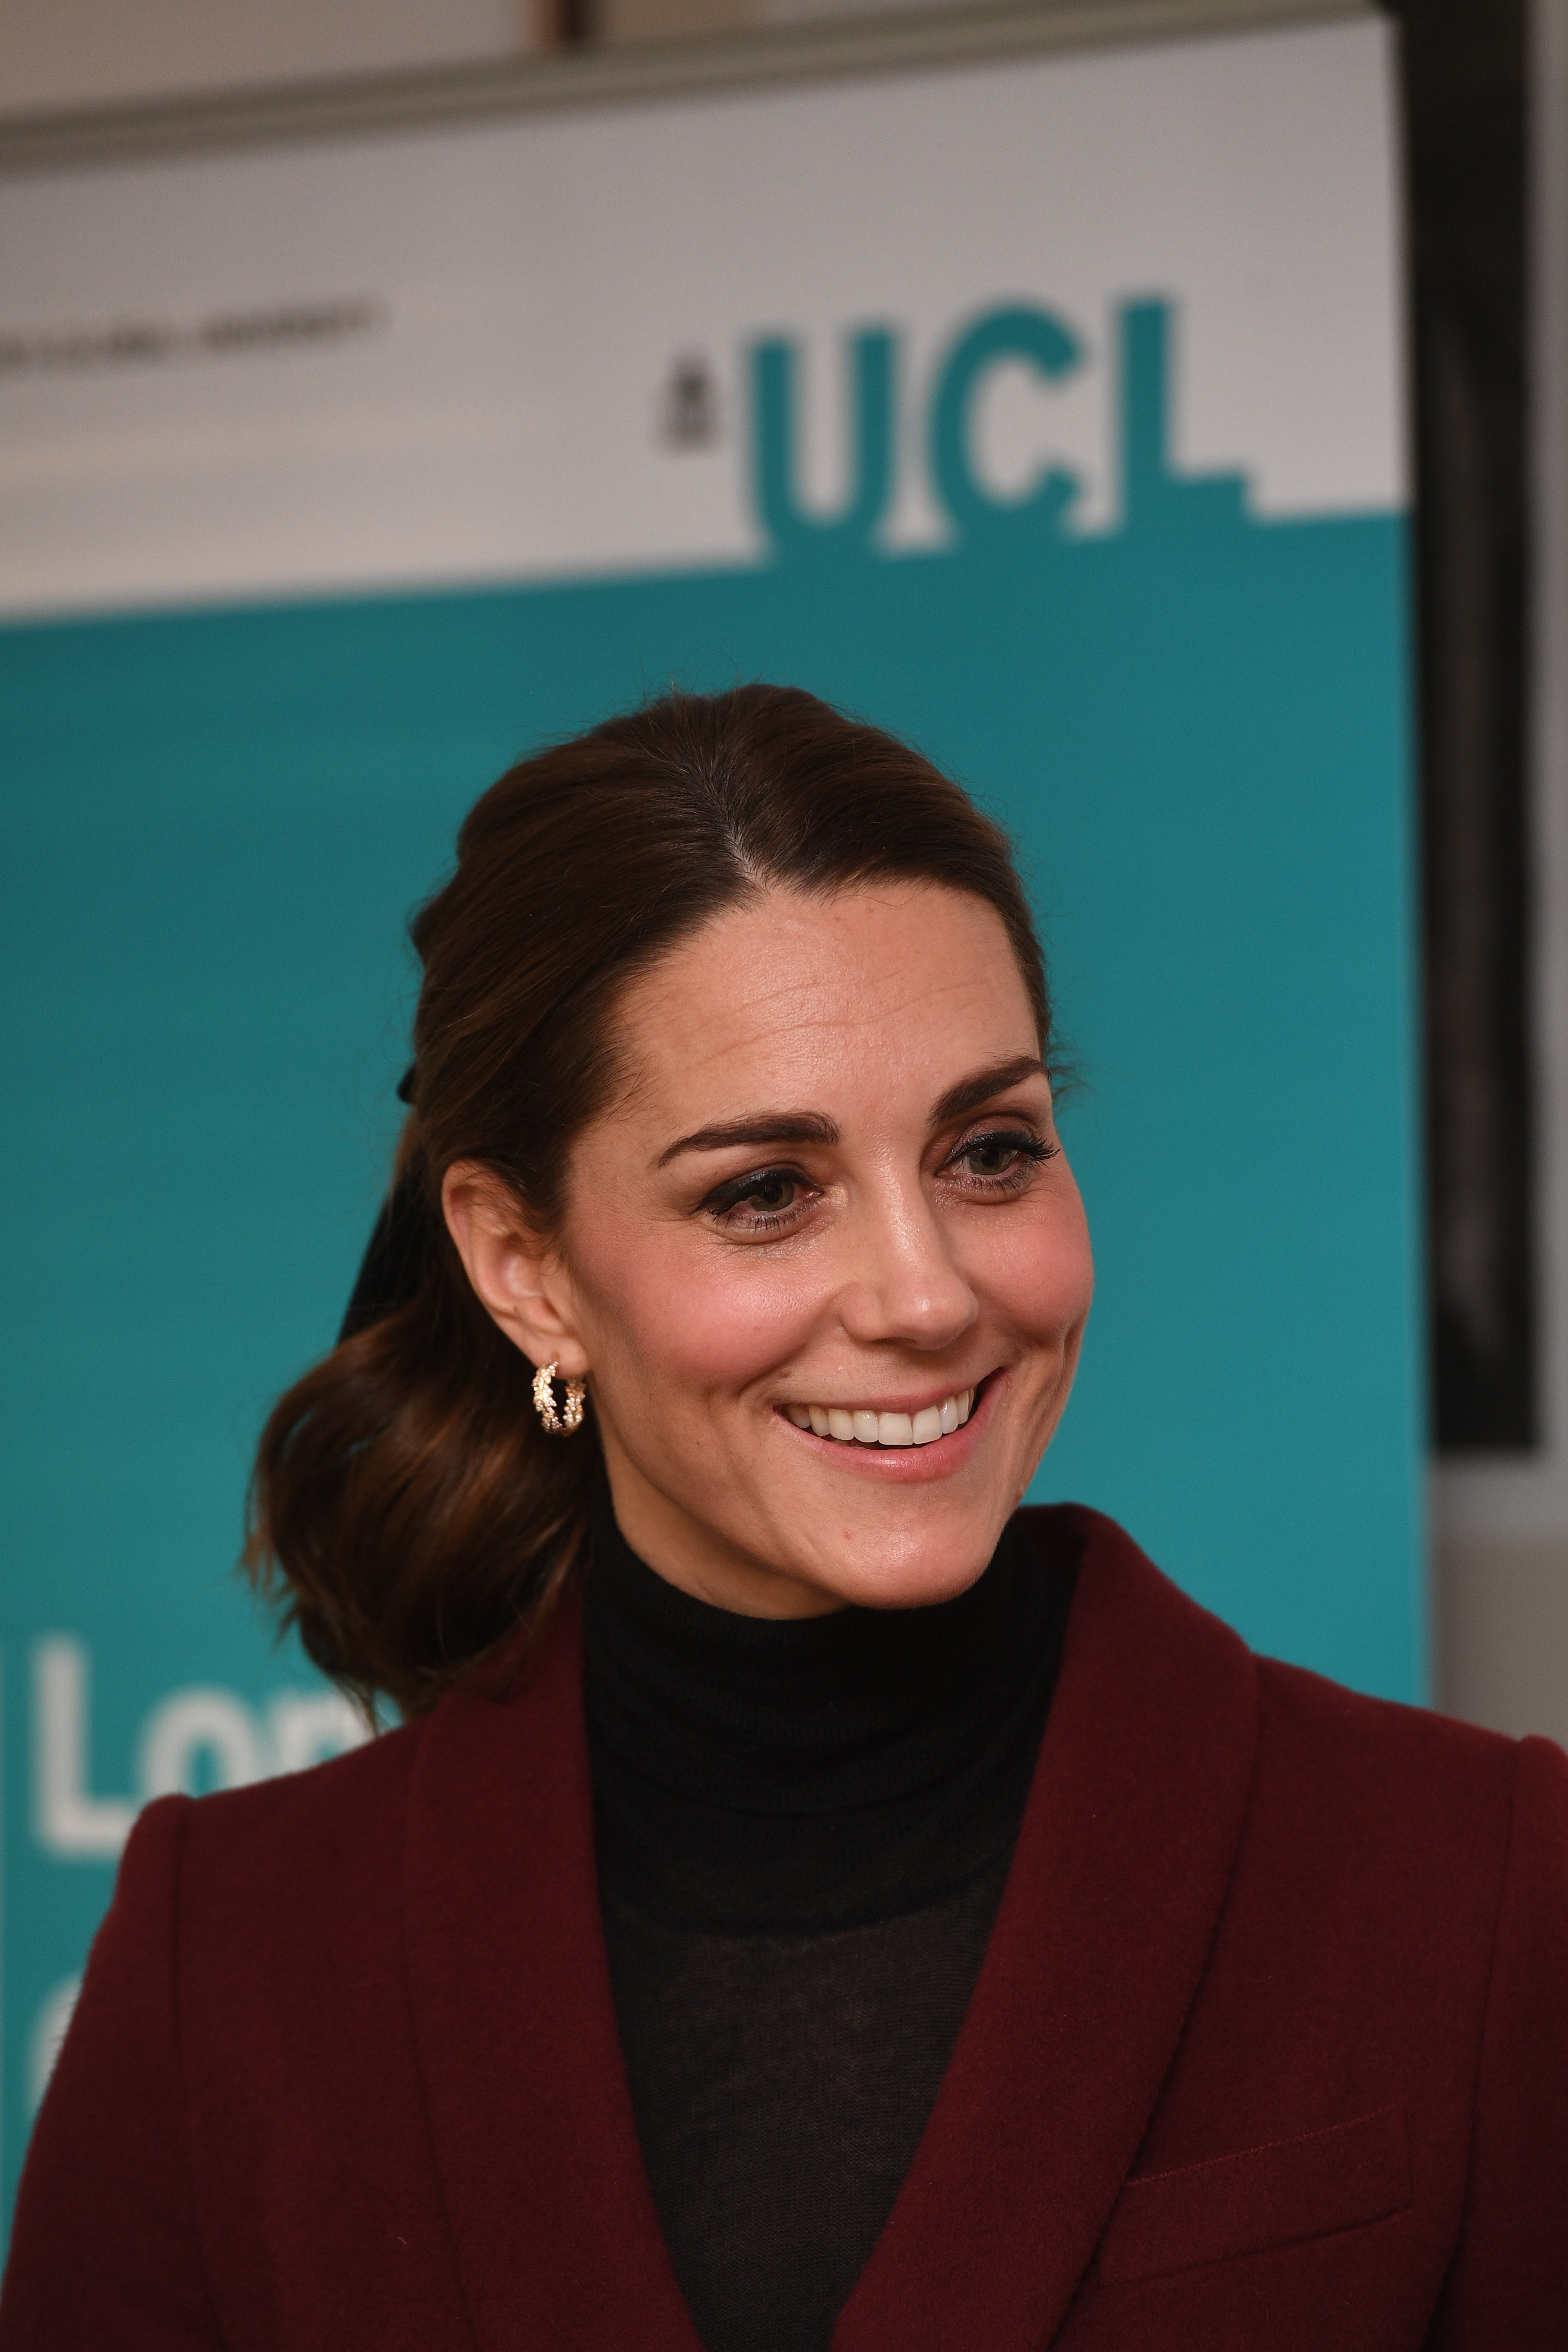 duchess of cambridge visits ucl developmental